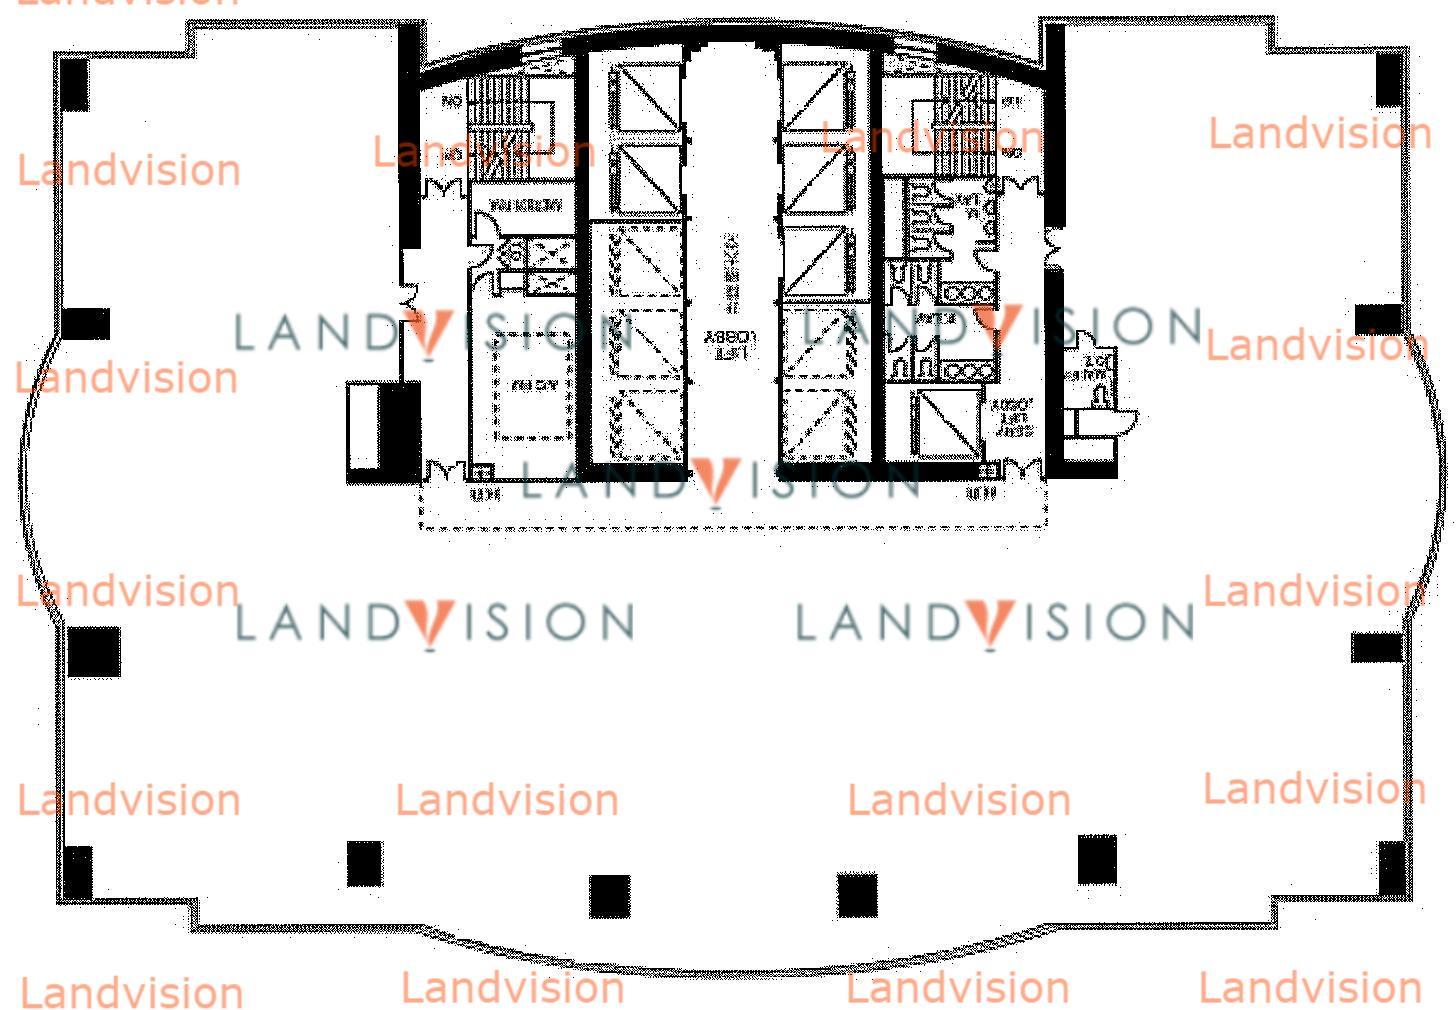 https://www.landvision.com.hk/wp-content/uploads/website/resize/floorplans/000550.JPG